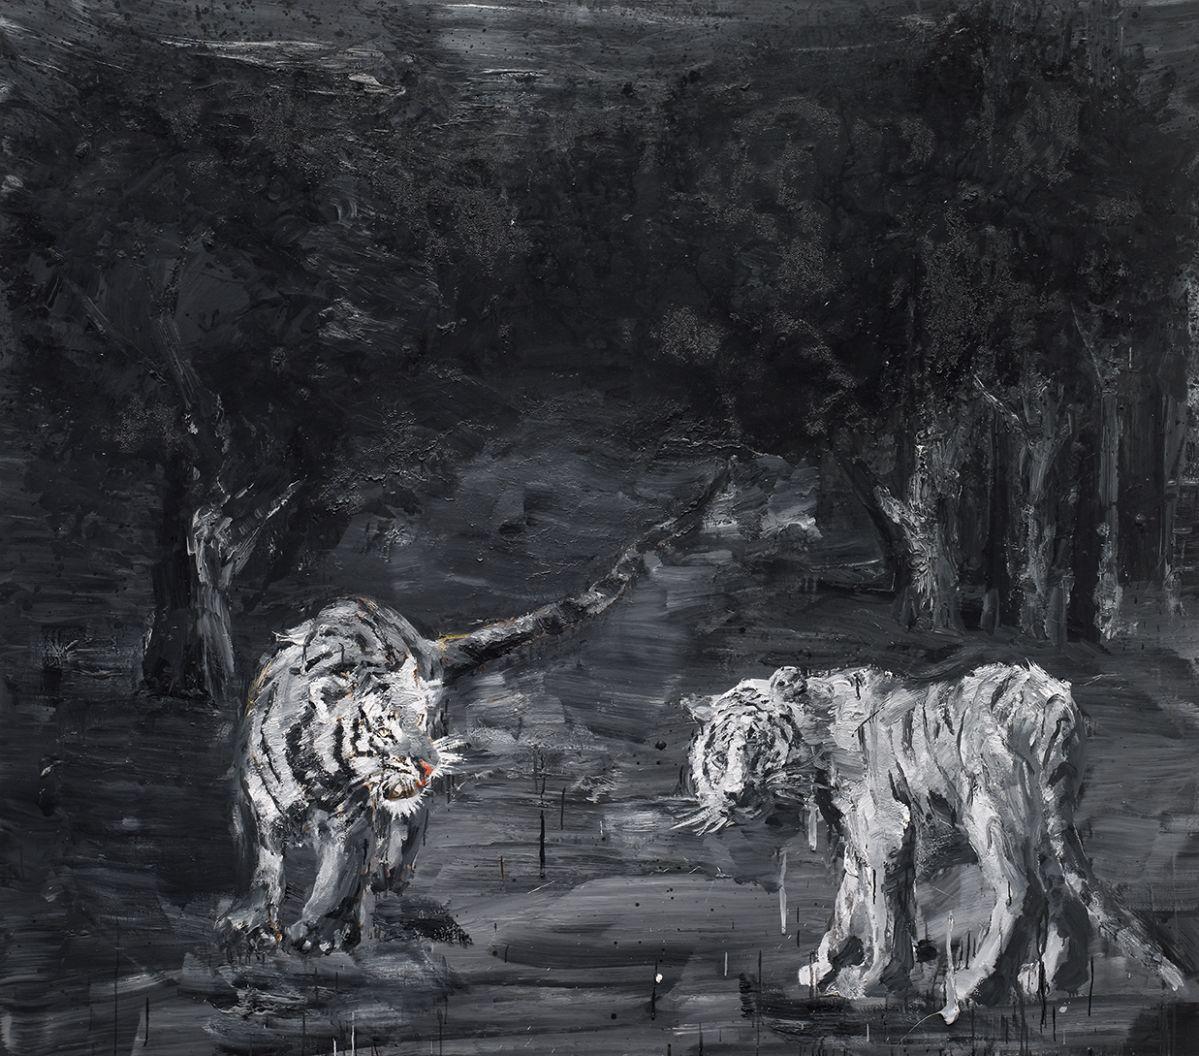 Yan Pei-Ming - Wild Game - The Way of the Tigers, 2011. © Yan Pei-Ming, Adagp, Paris, 2021 - Photo André Morin